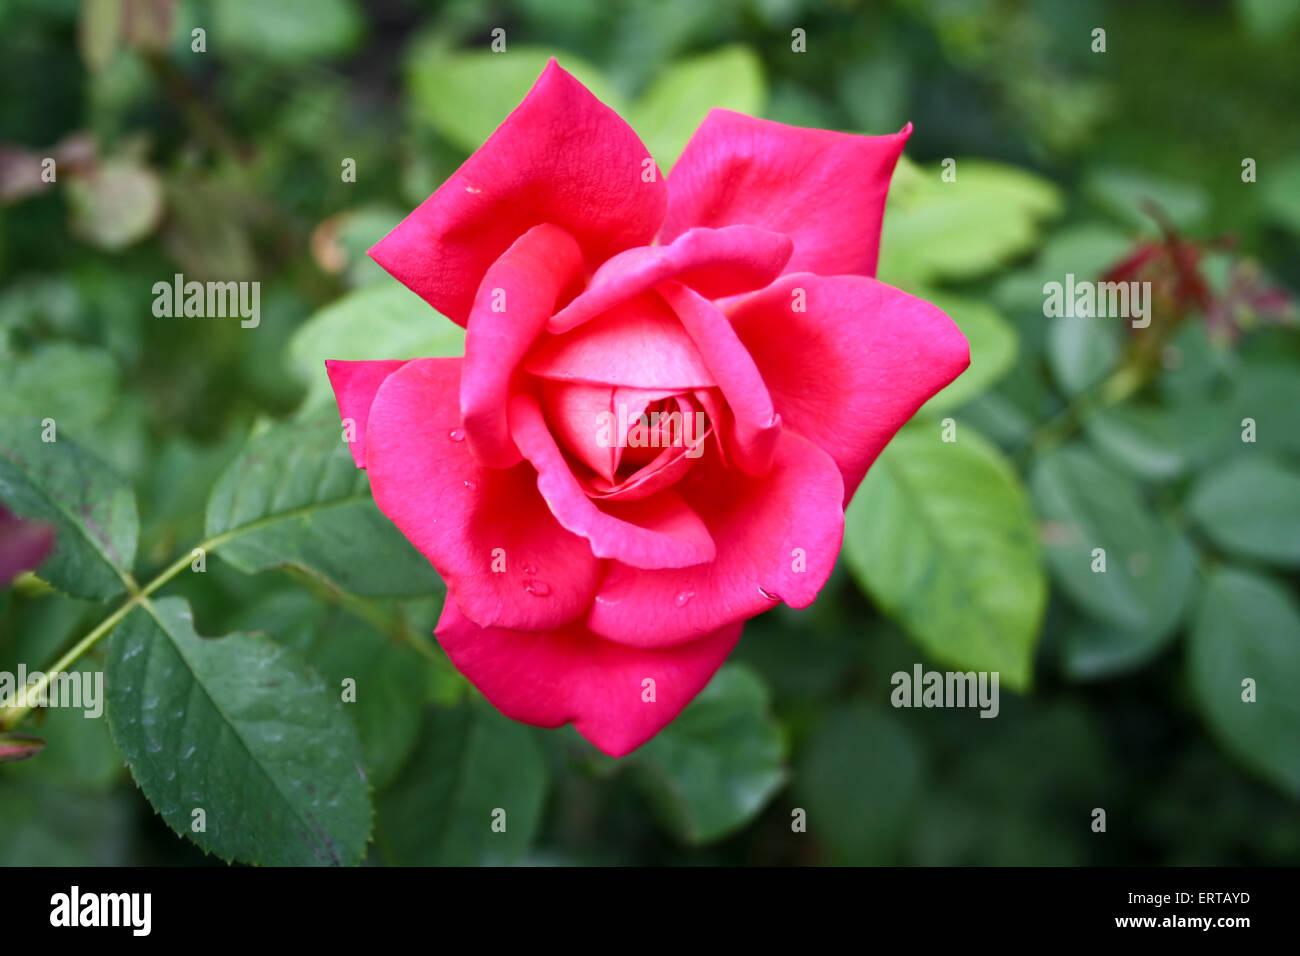 Beautiful, romantic rose flower - Rosaceae - Stock Image